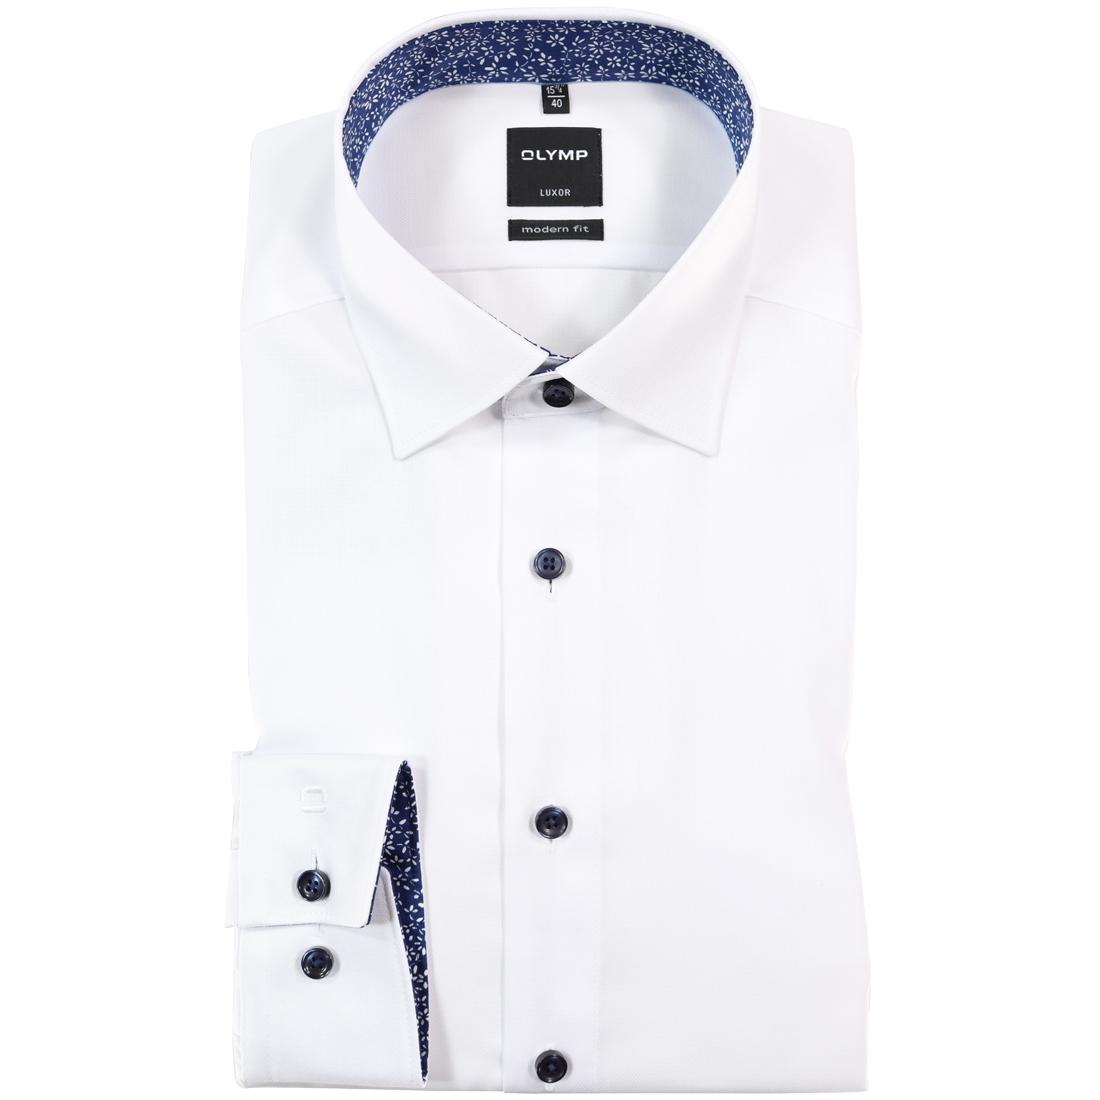 OLYMP overhemd Modern Fit 070464 in het Wit